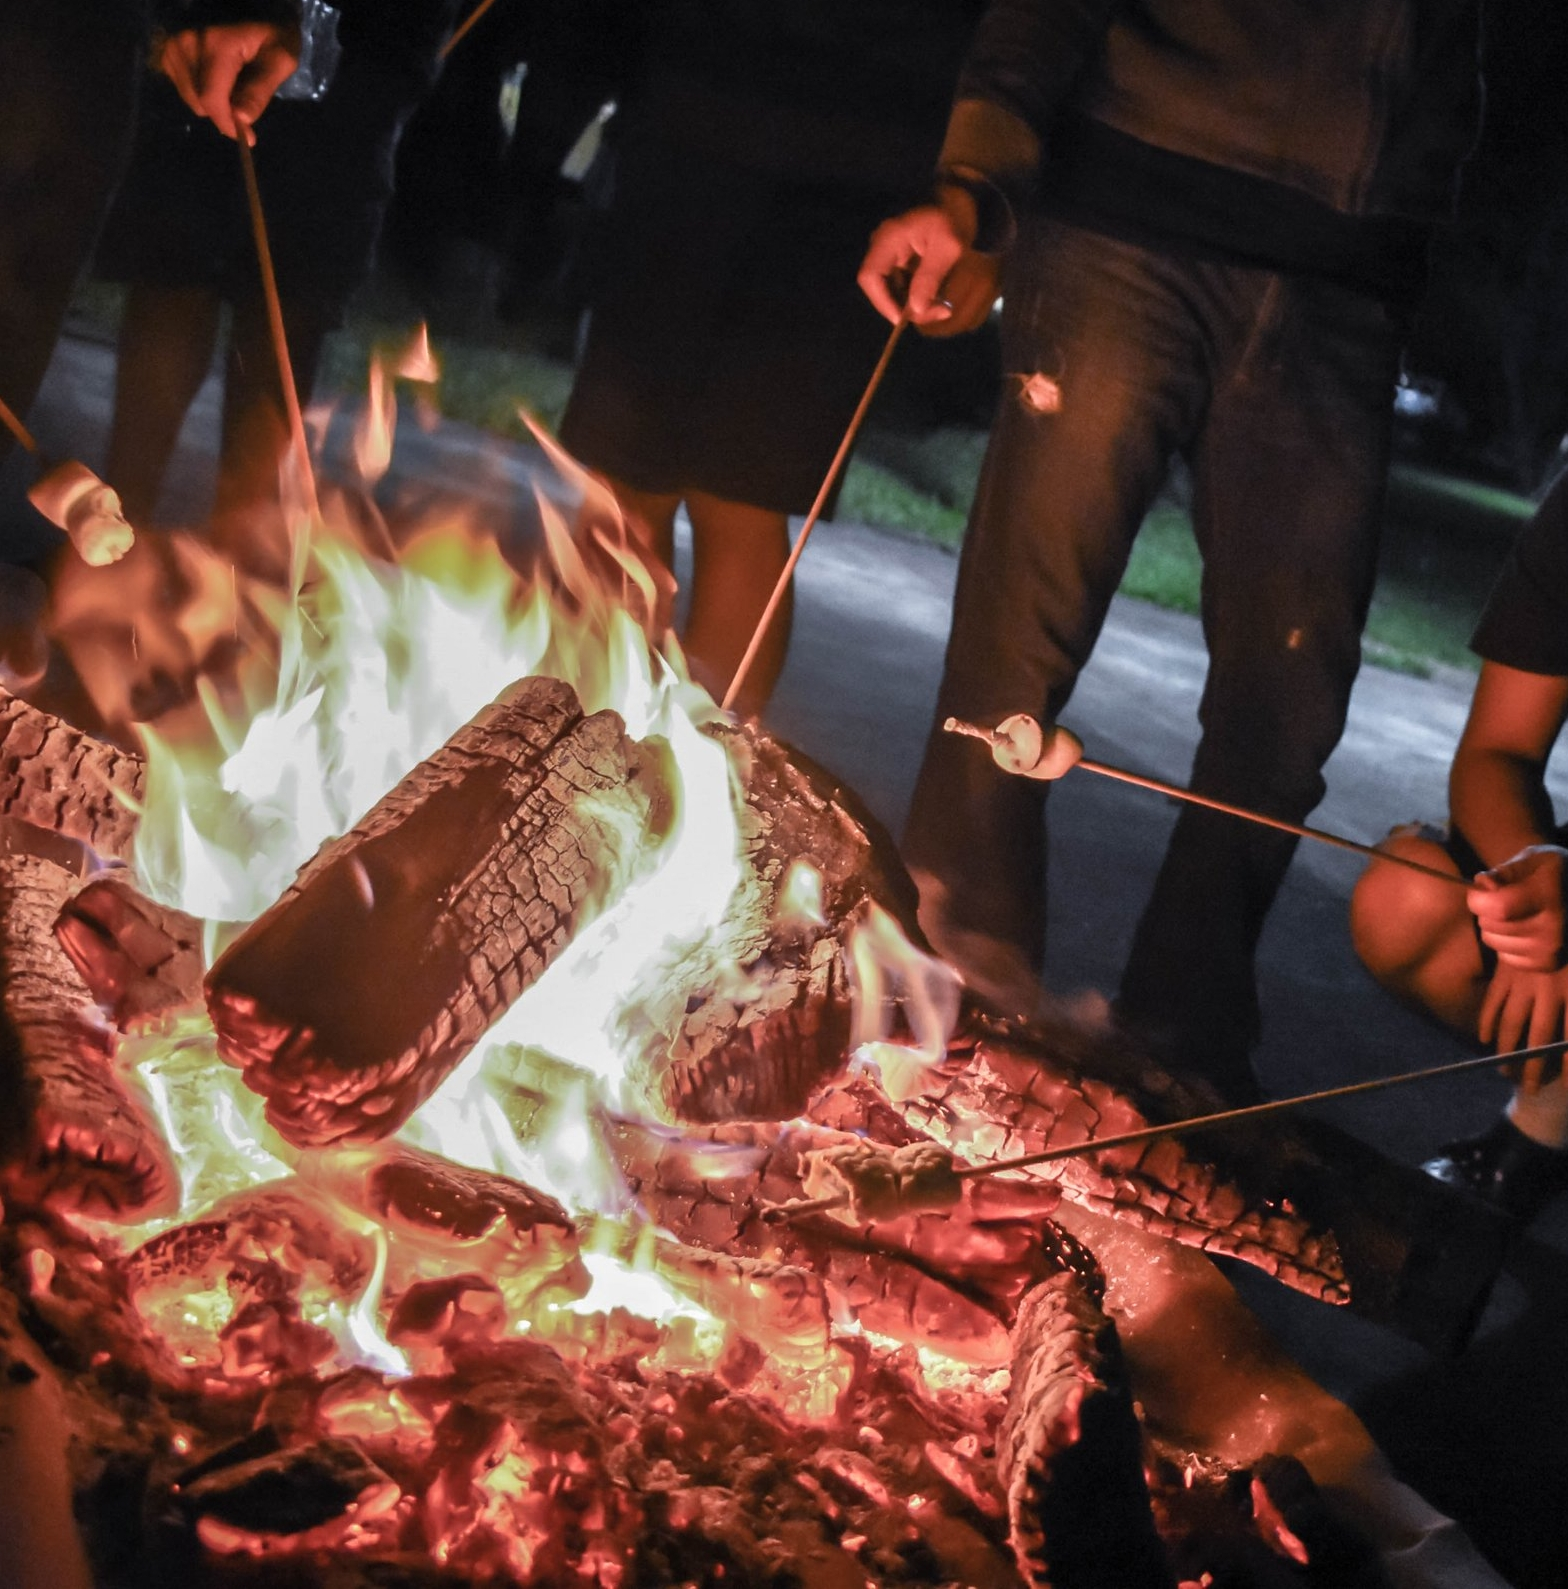 adult-campfire-celebration-783928.jpg